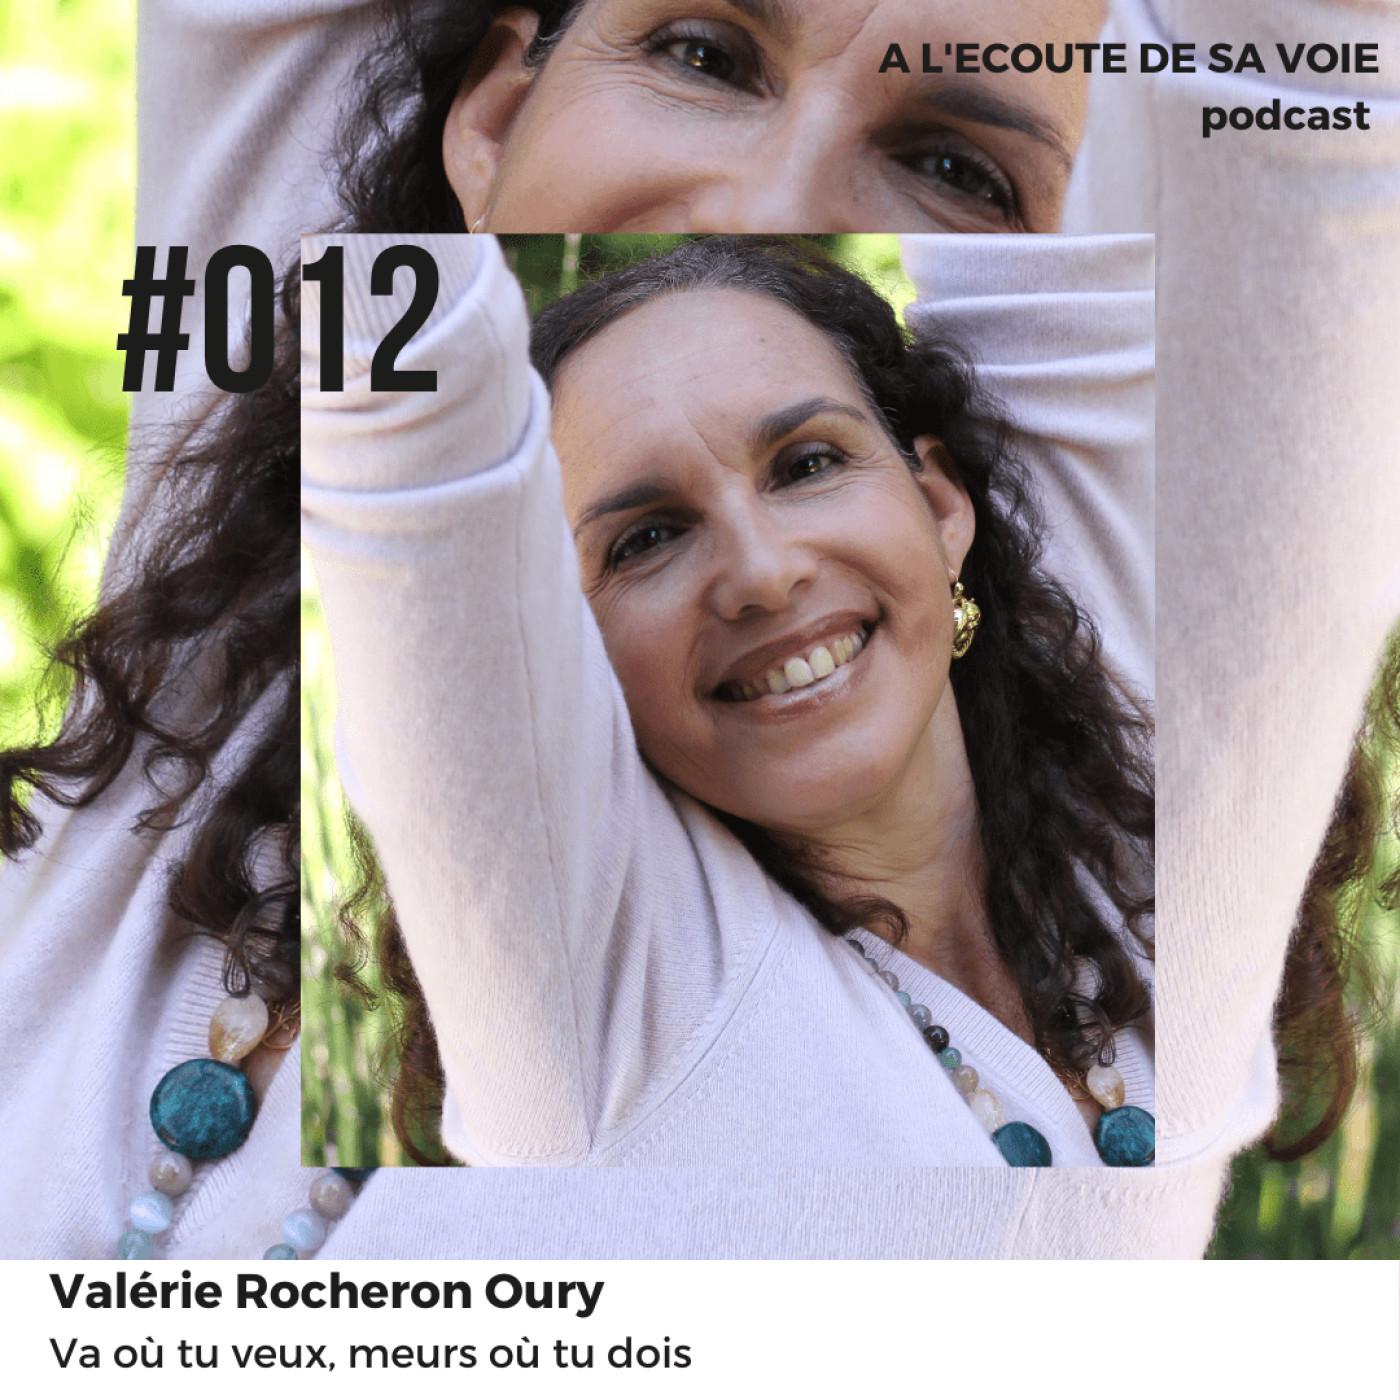 #012 Valerie Rocheron Oury - Va où tu veux, meurs où tu dois